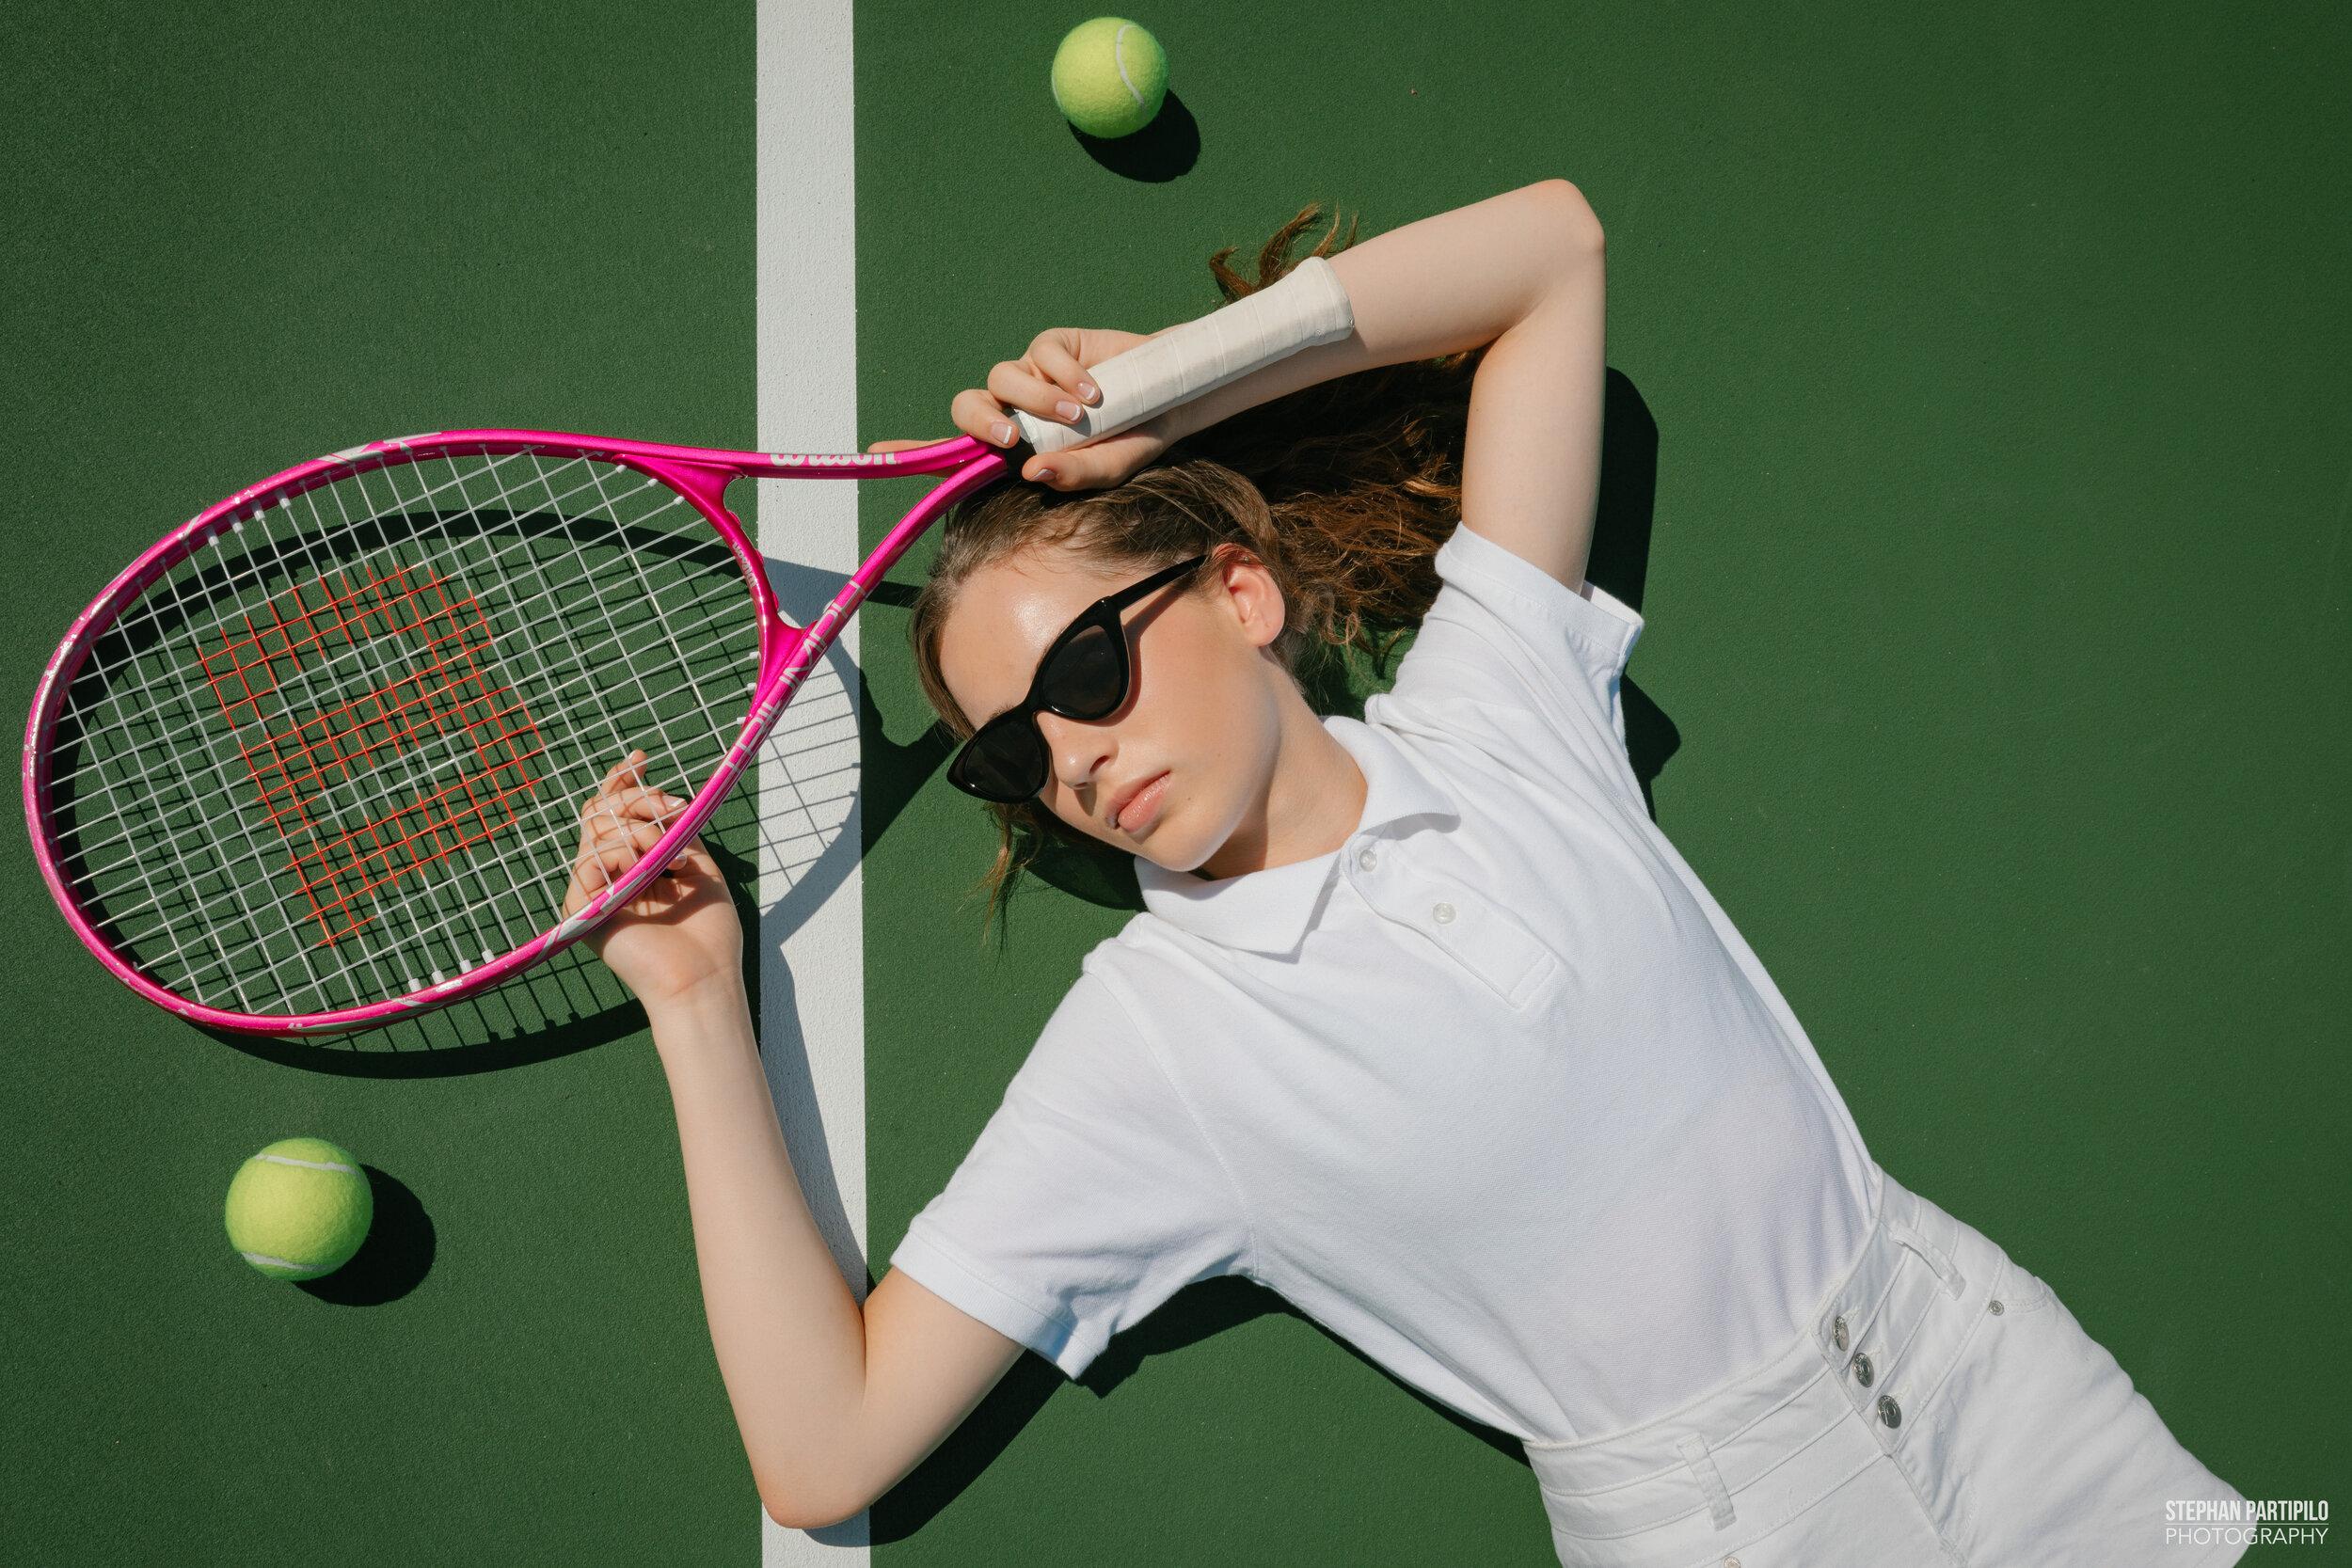 Karin Tennis Golf 2019 SP Favs IG 0G5A1204.jpg